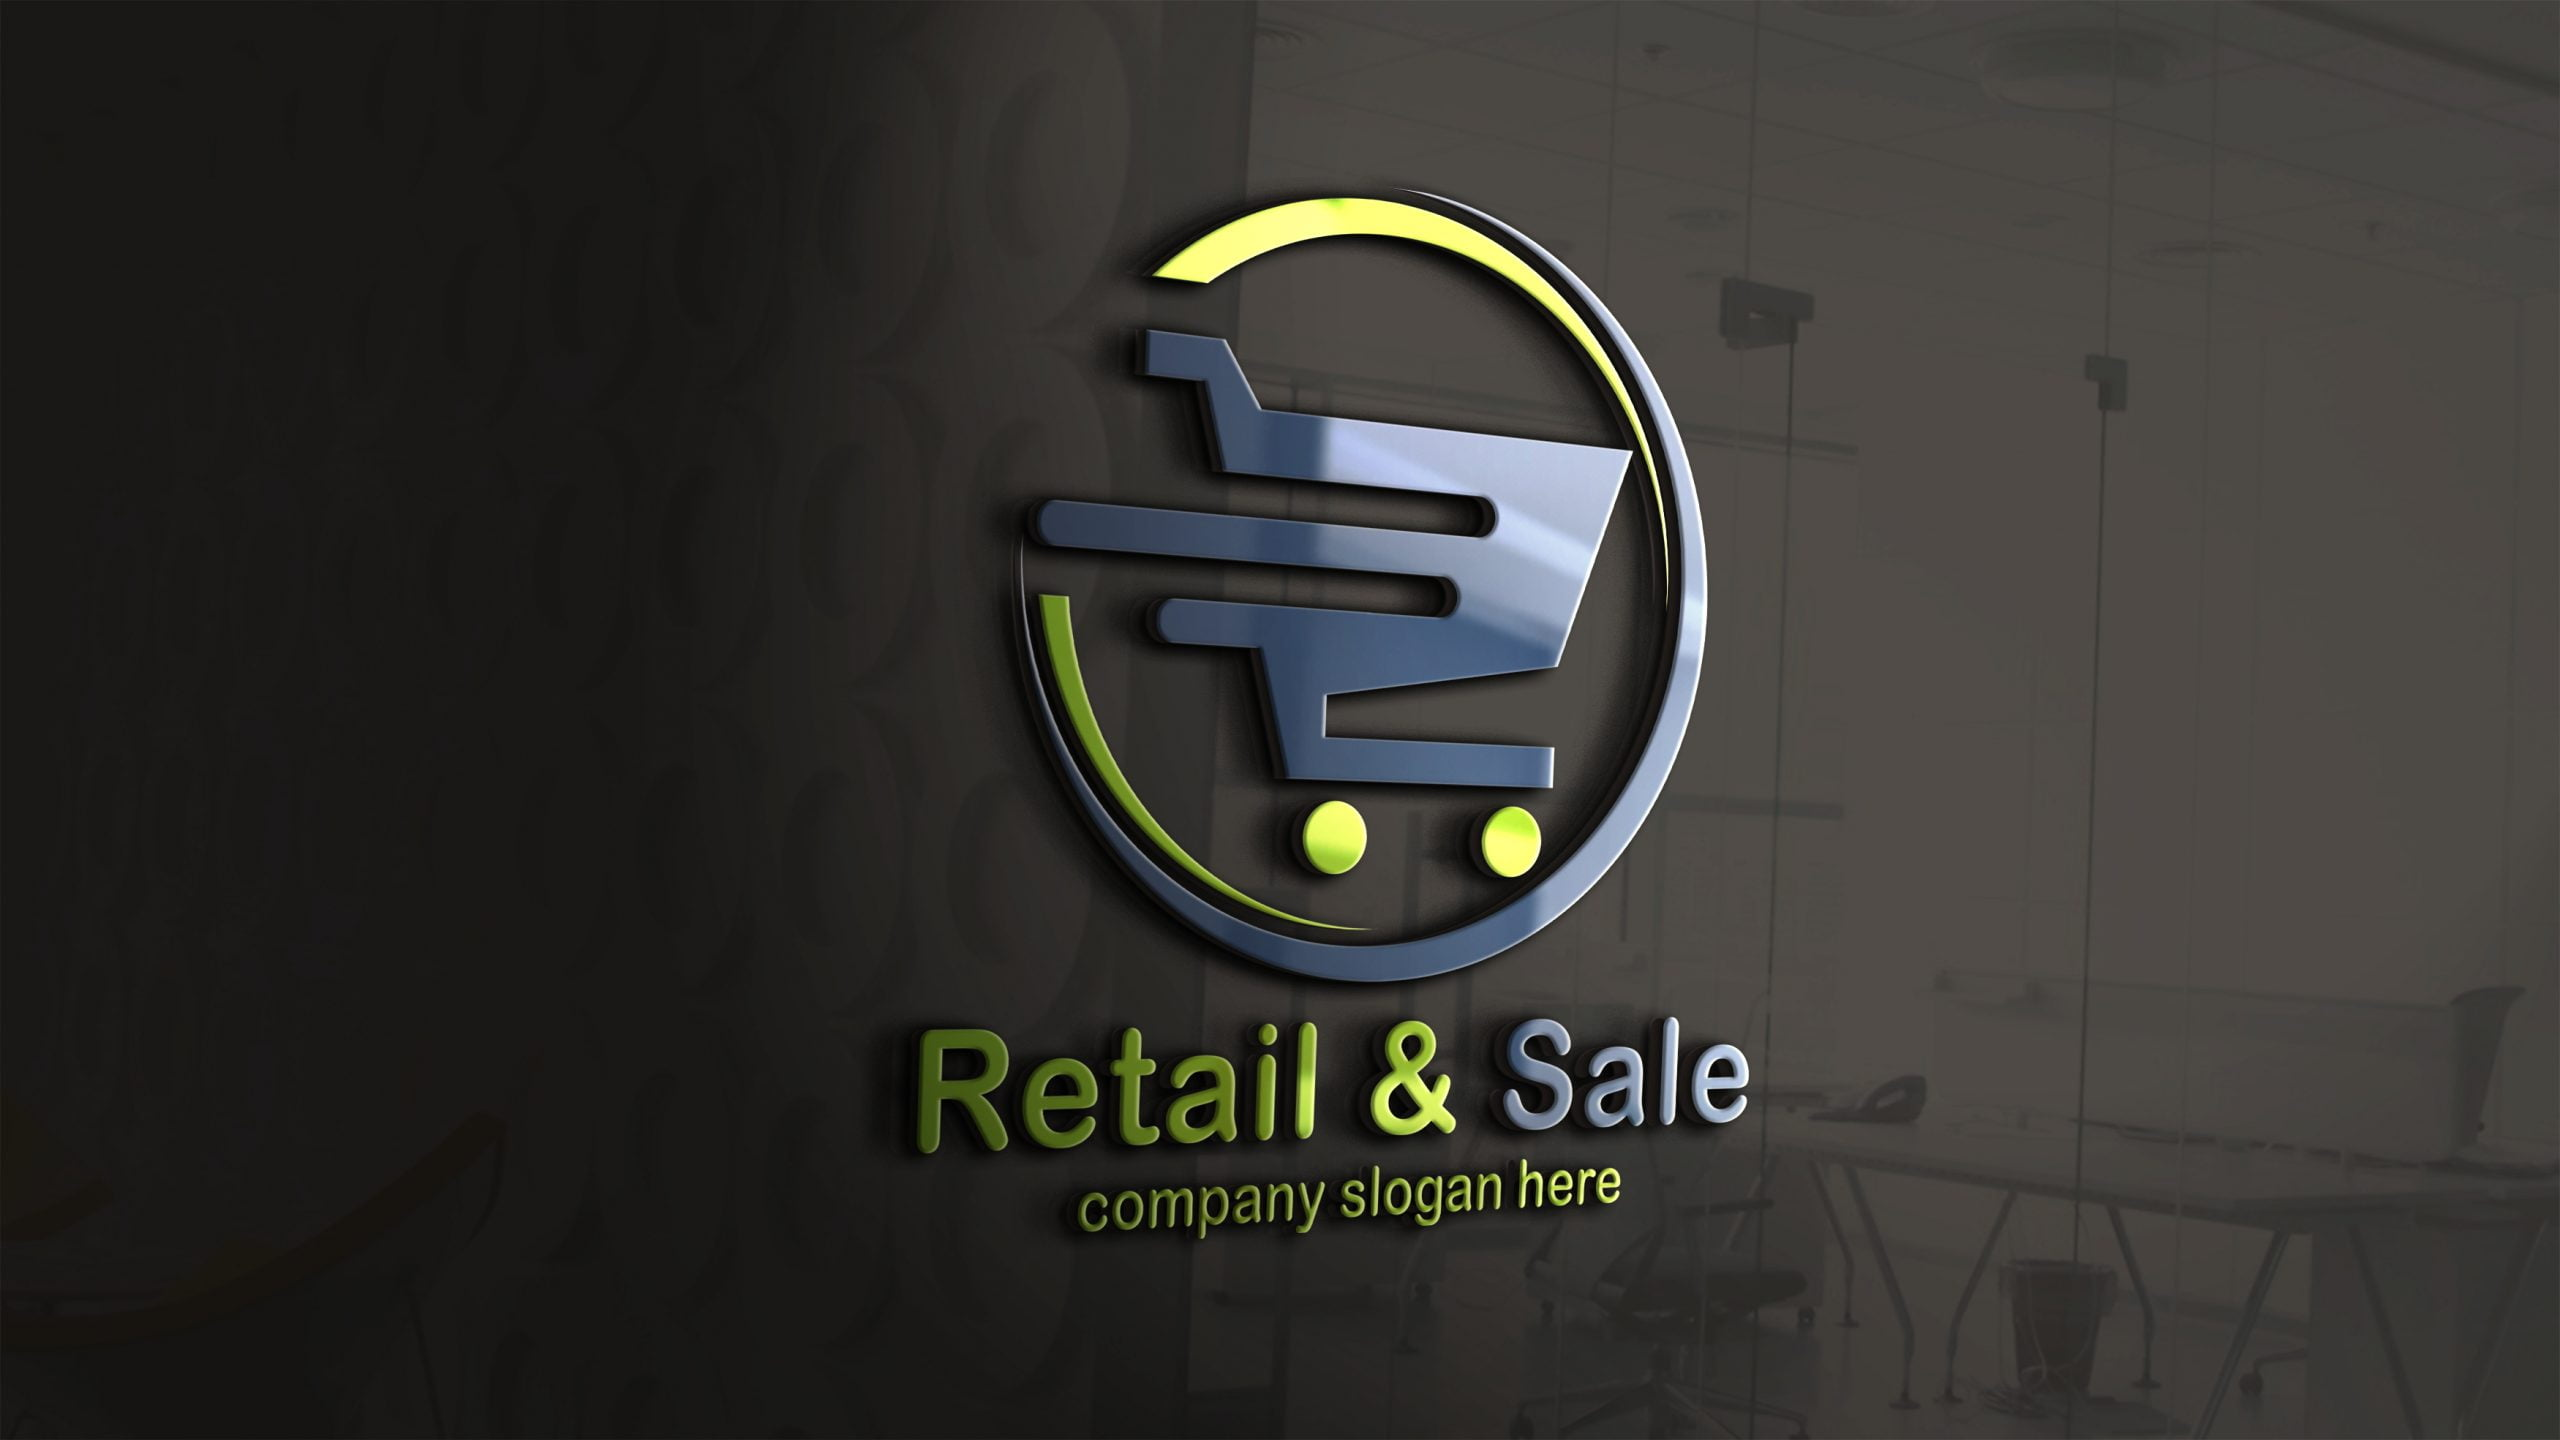 Online shopping logo design on 3d glass wall